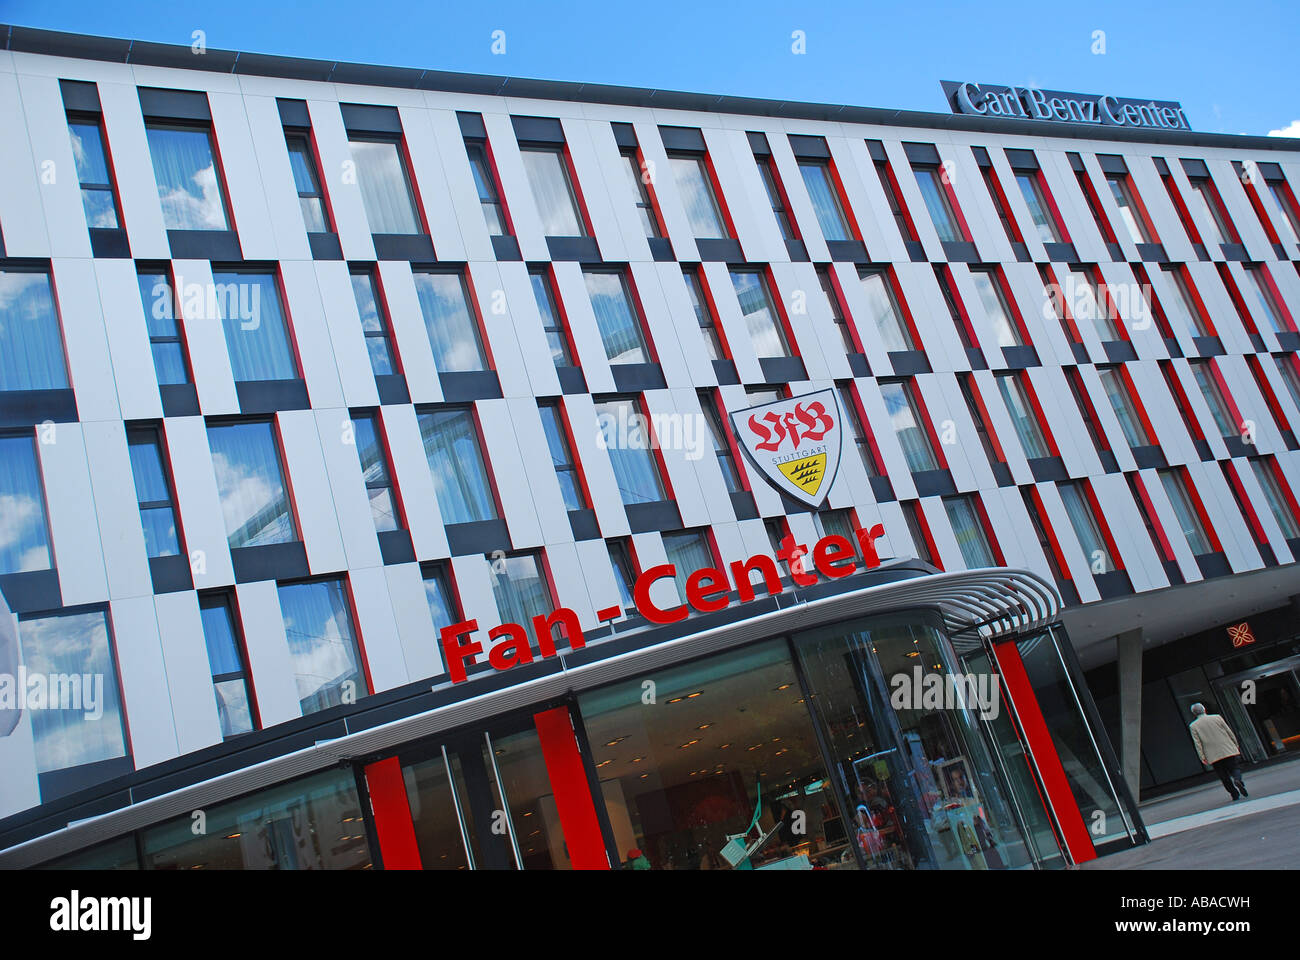 Vfb Fan Center im Carl Benz Center Stuttgart Baden Württemberg Deutschland - Stock Image